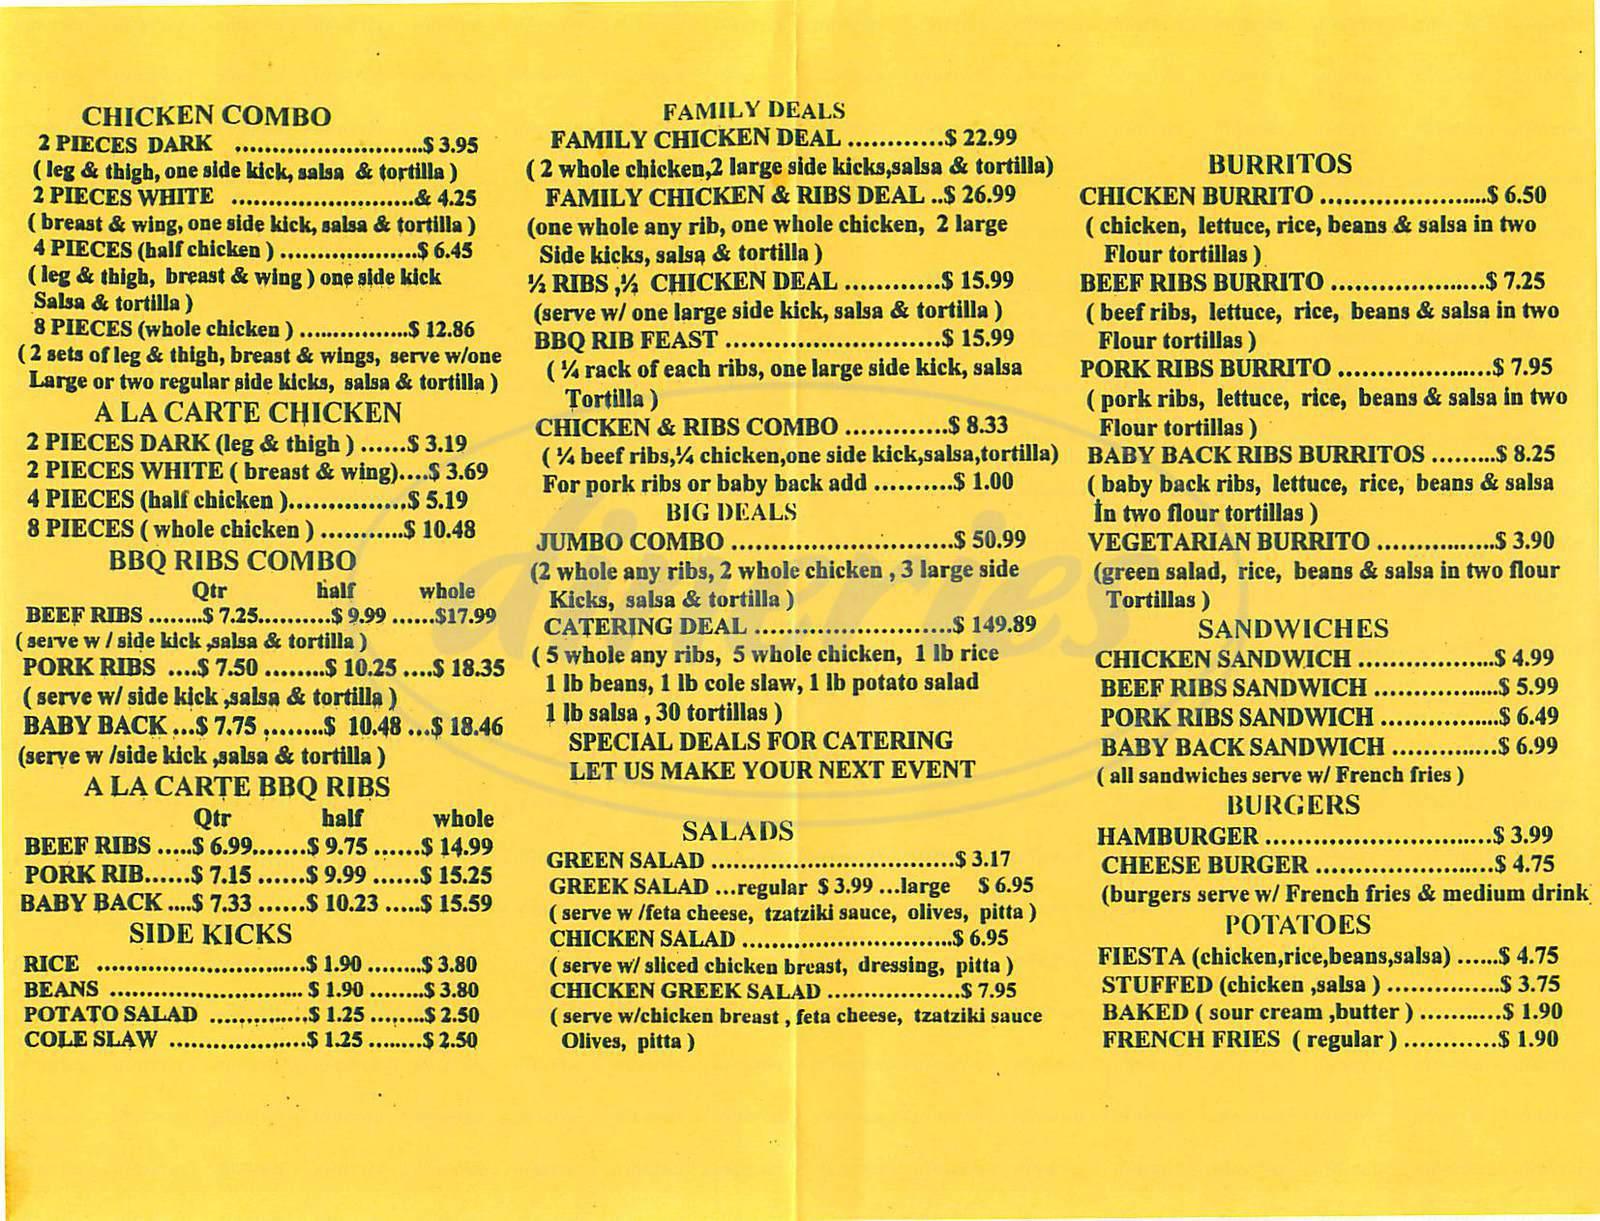 menu for Flaming Chicken & Ribs